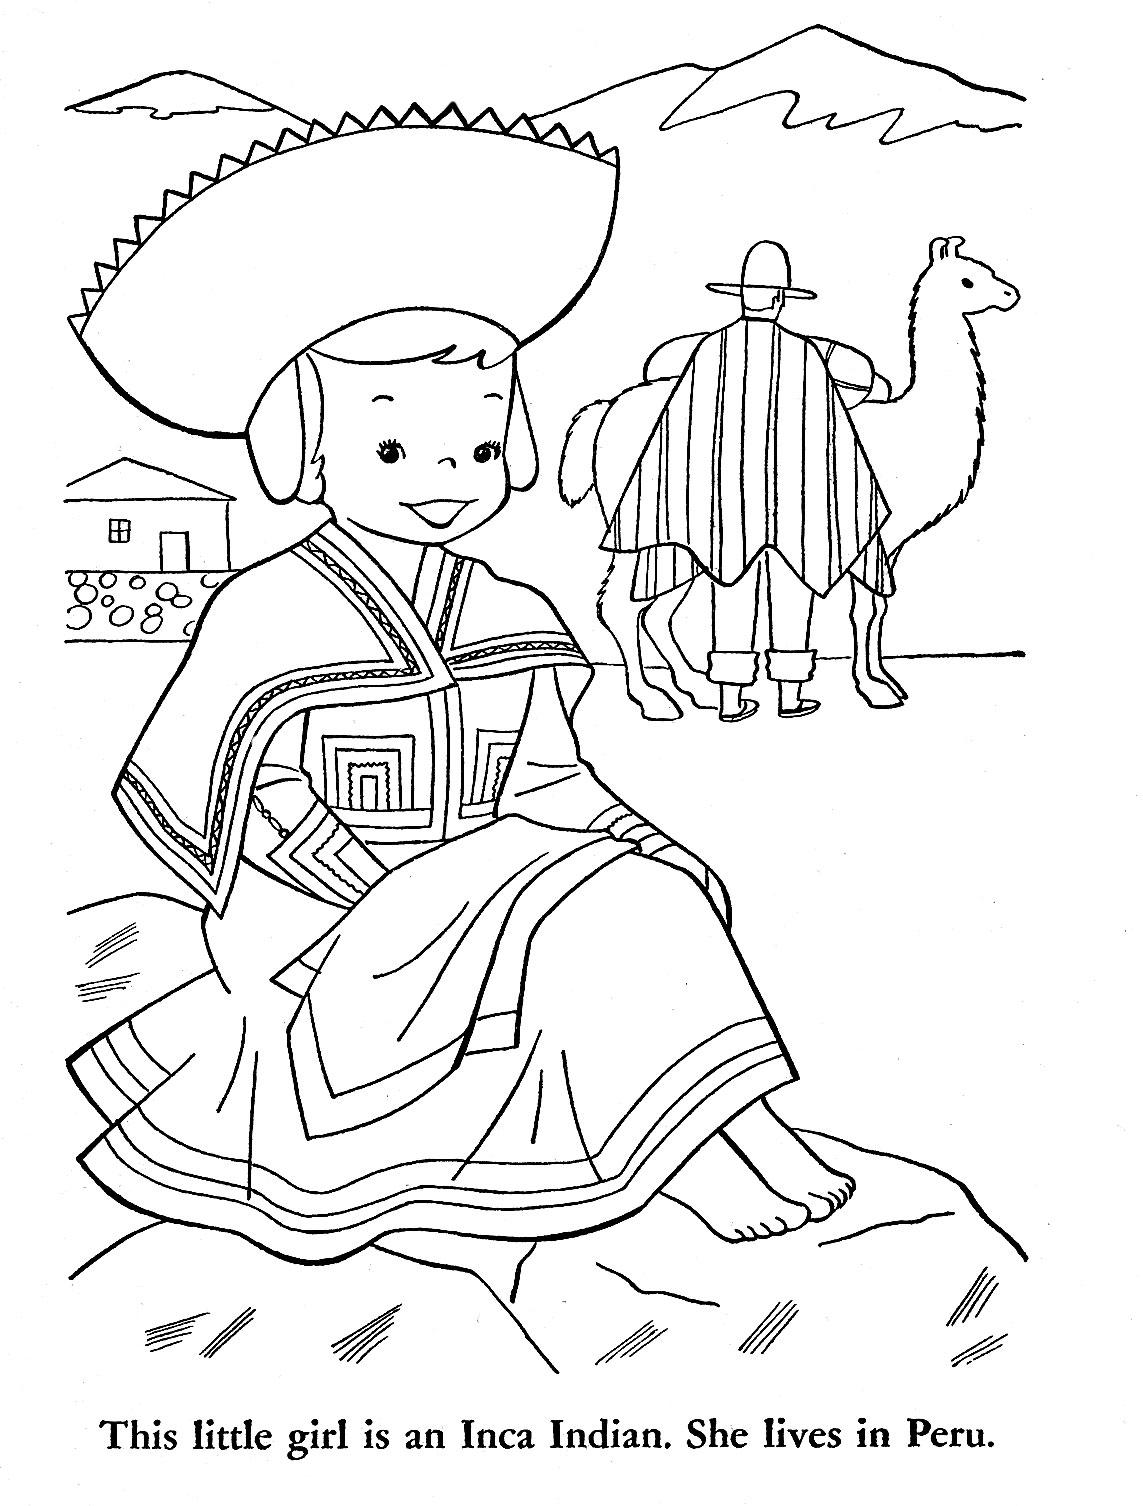 Peruvian Drawing at GetDrawings.com   Free for personal use Peruvian ...